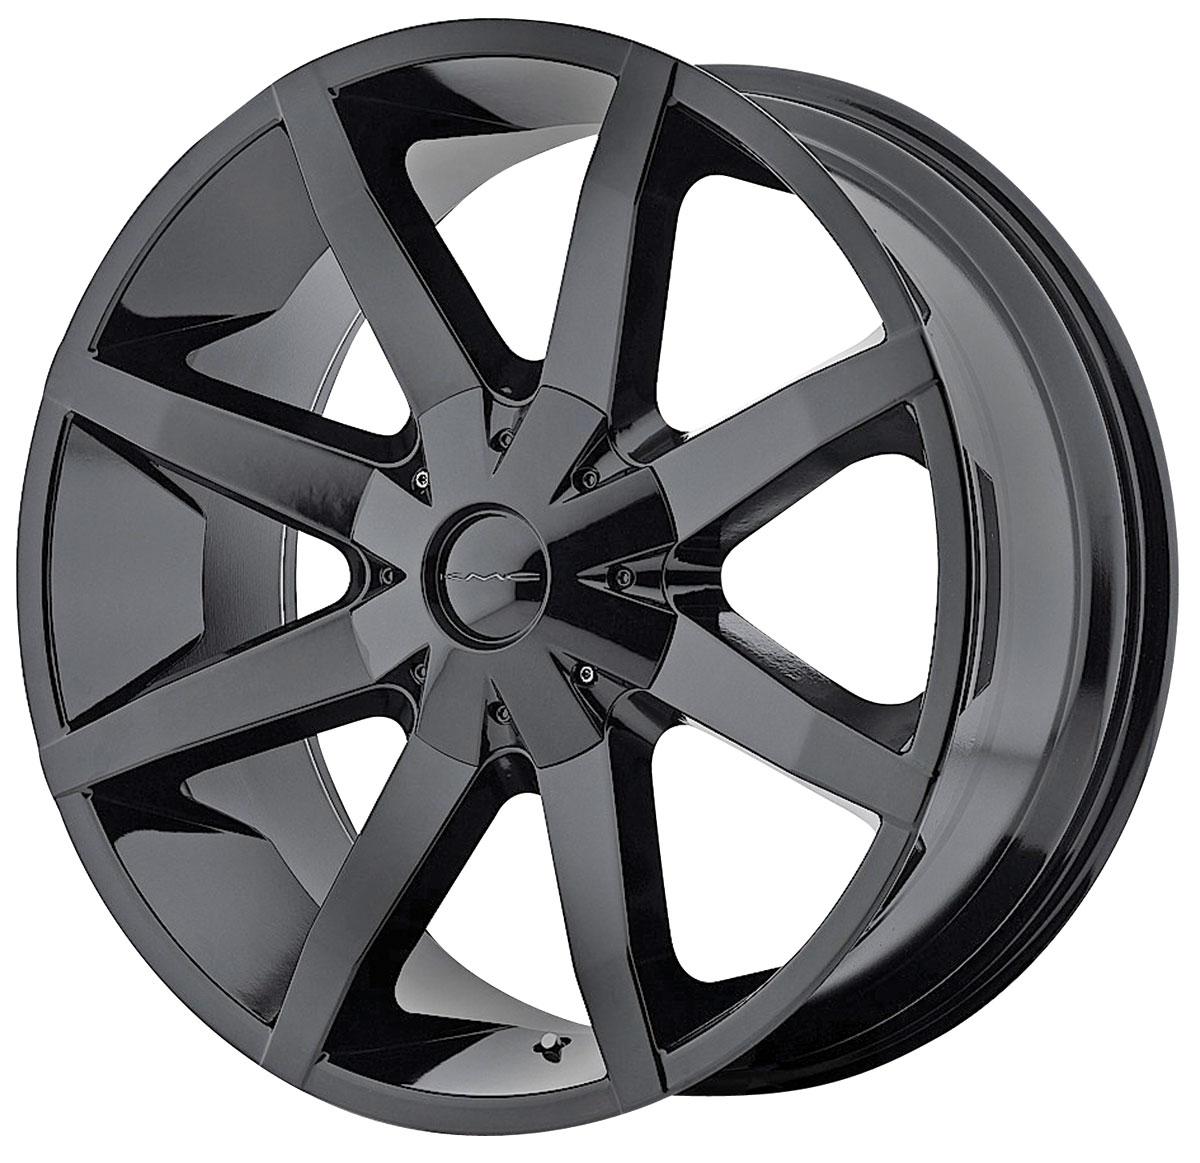 Wheel, KMC, KM651 SLIDE, 1999-2019 Escalade, 24X9.5